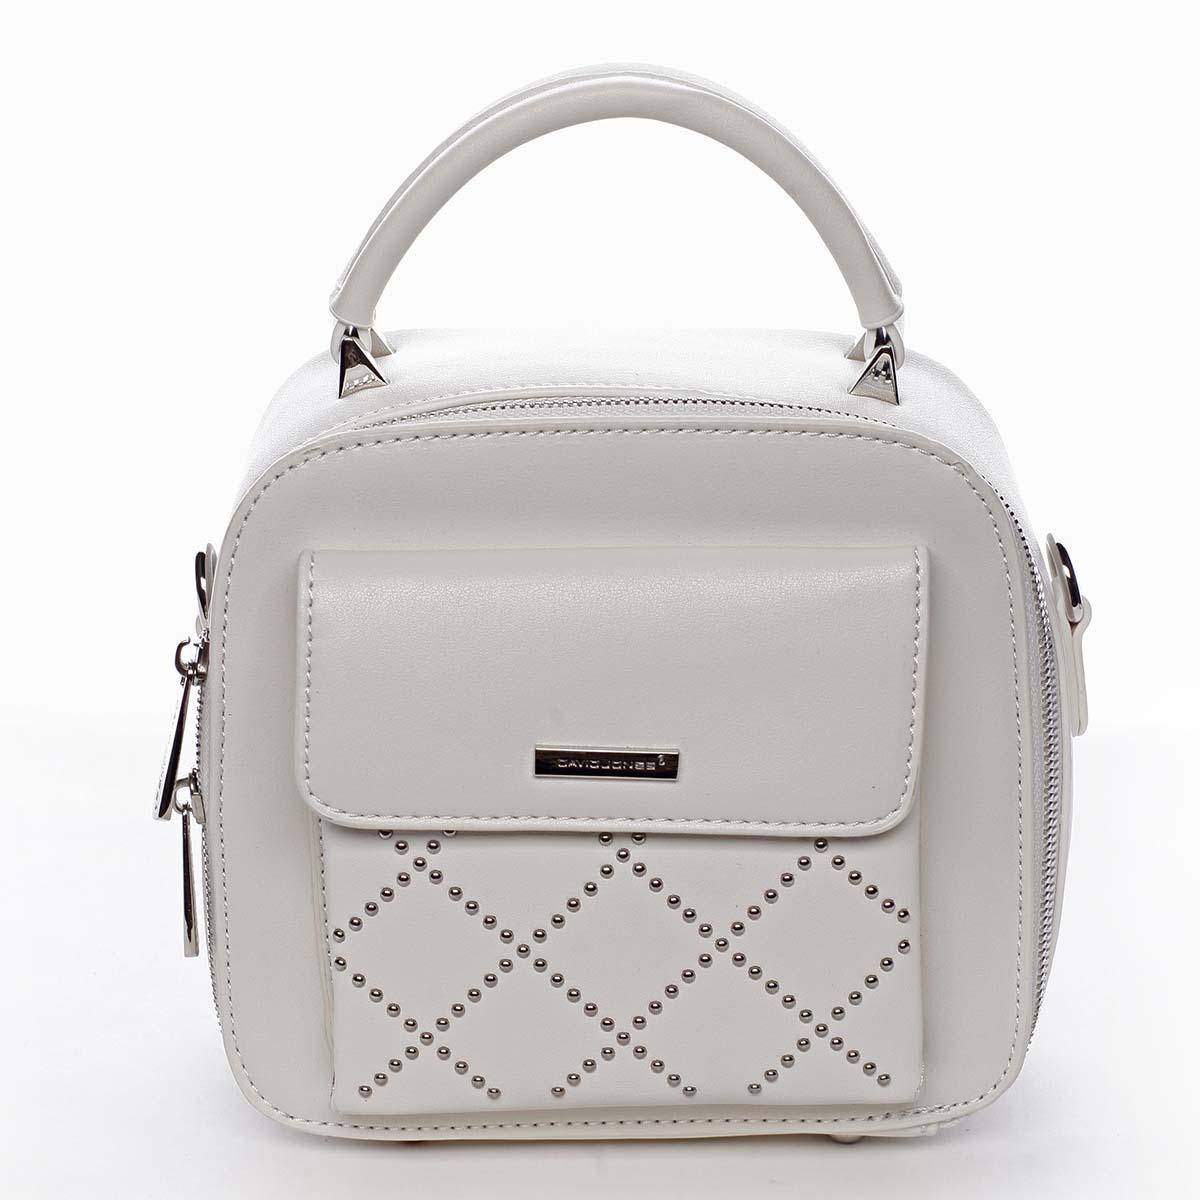 Luxusná malá dámska kabelka do ruky biela - David Jones Stela biela